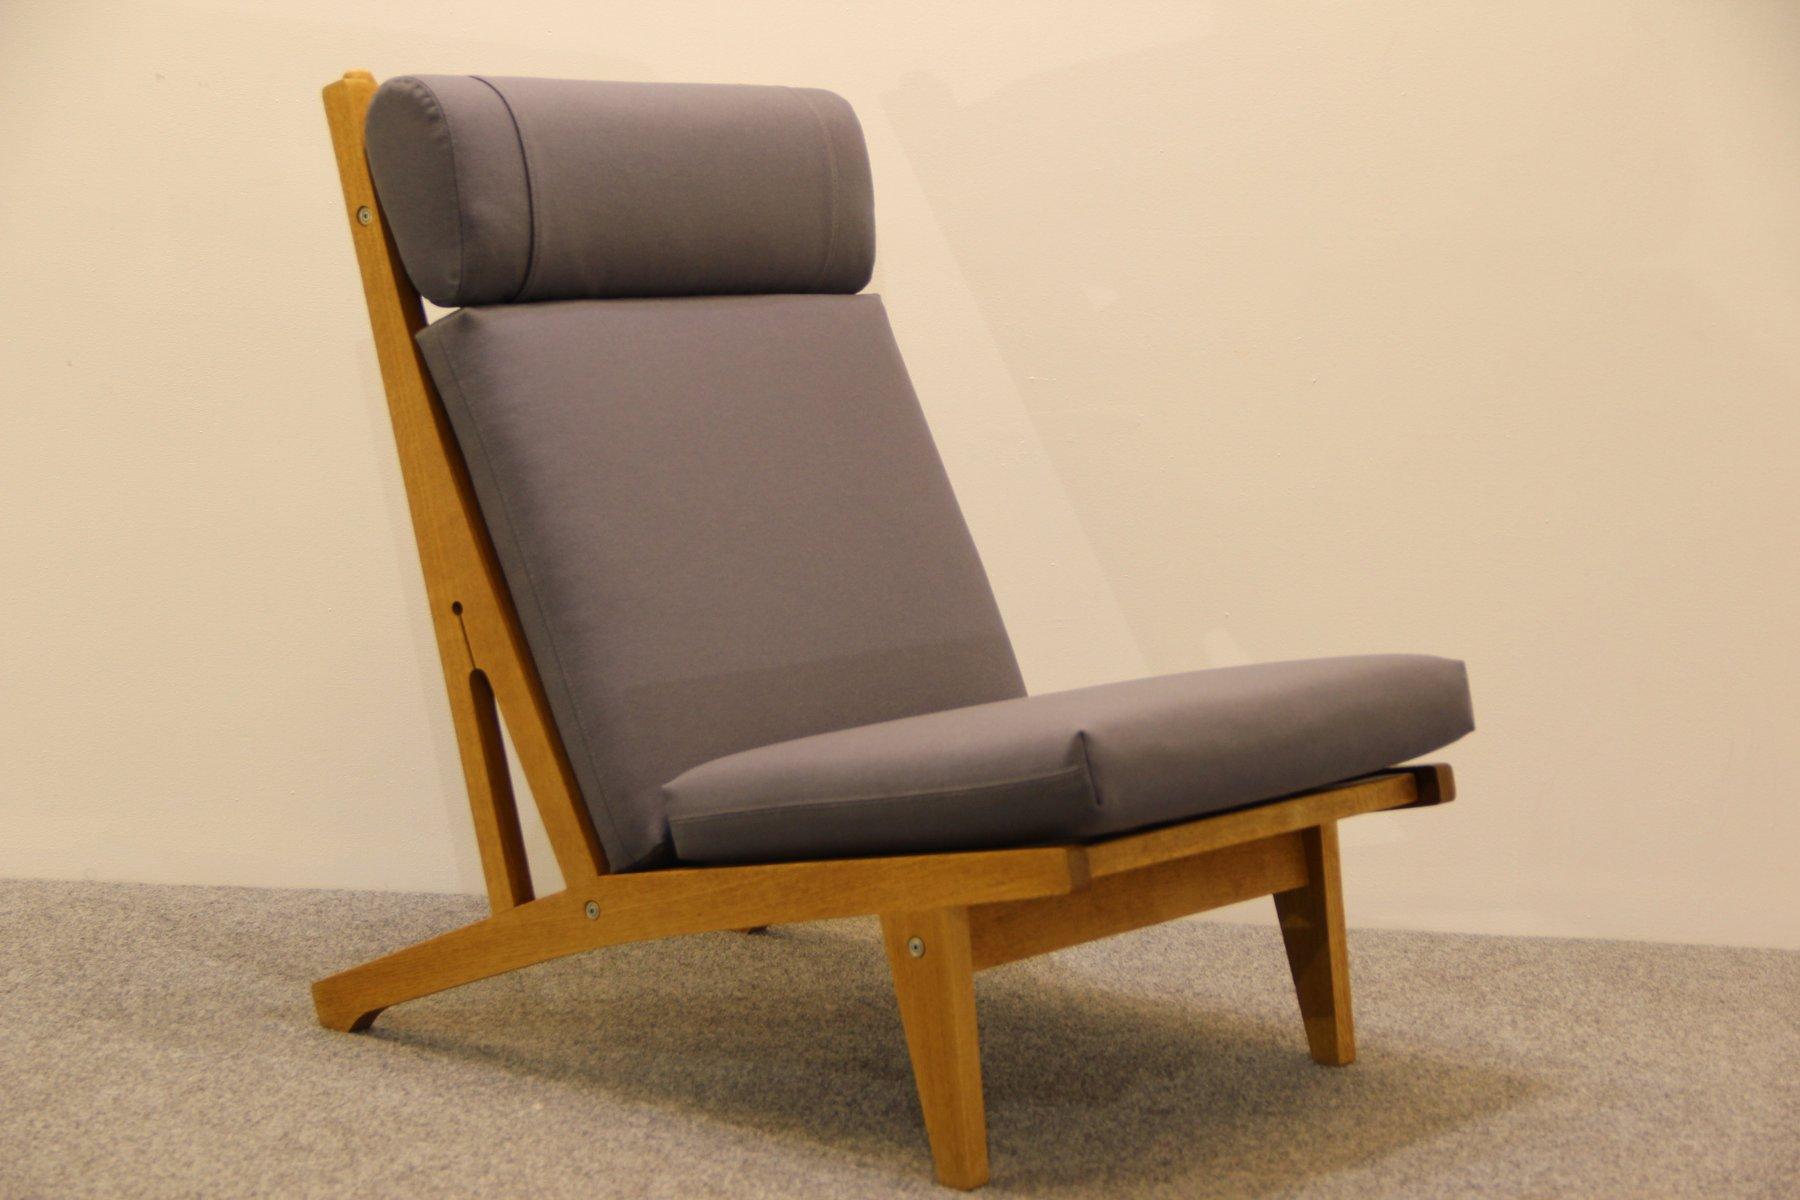 hans j wegner furniture. Danish Oak Lounge Chair By Hans J. Wegner For Getama, 1960s J Furniture